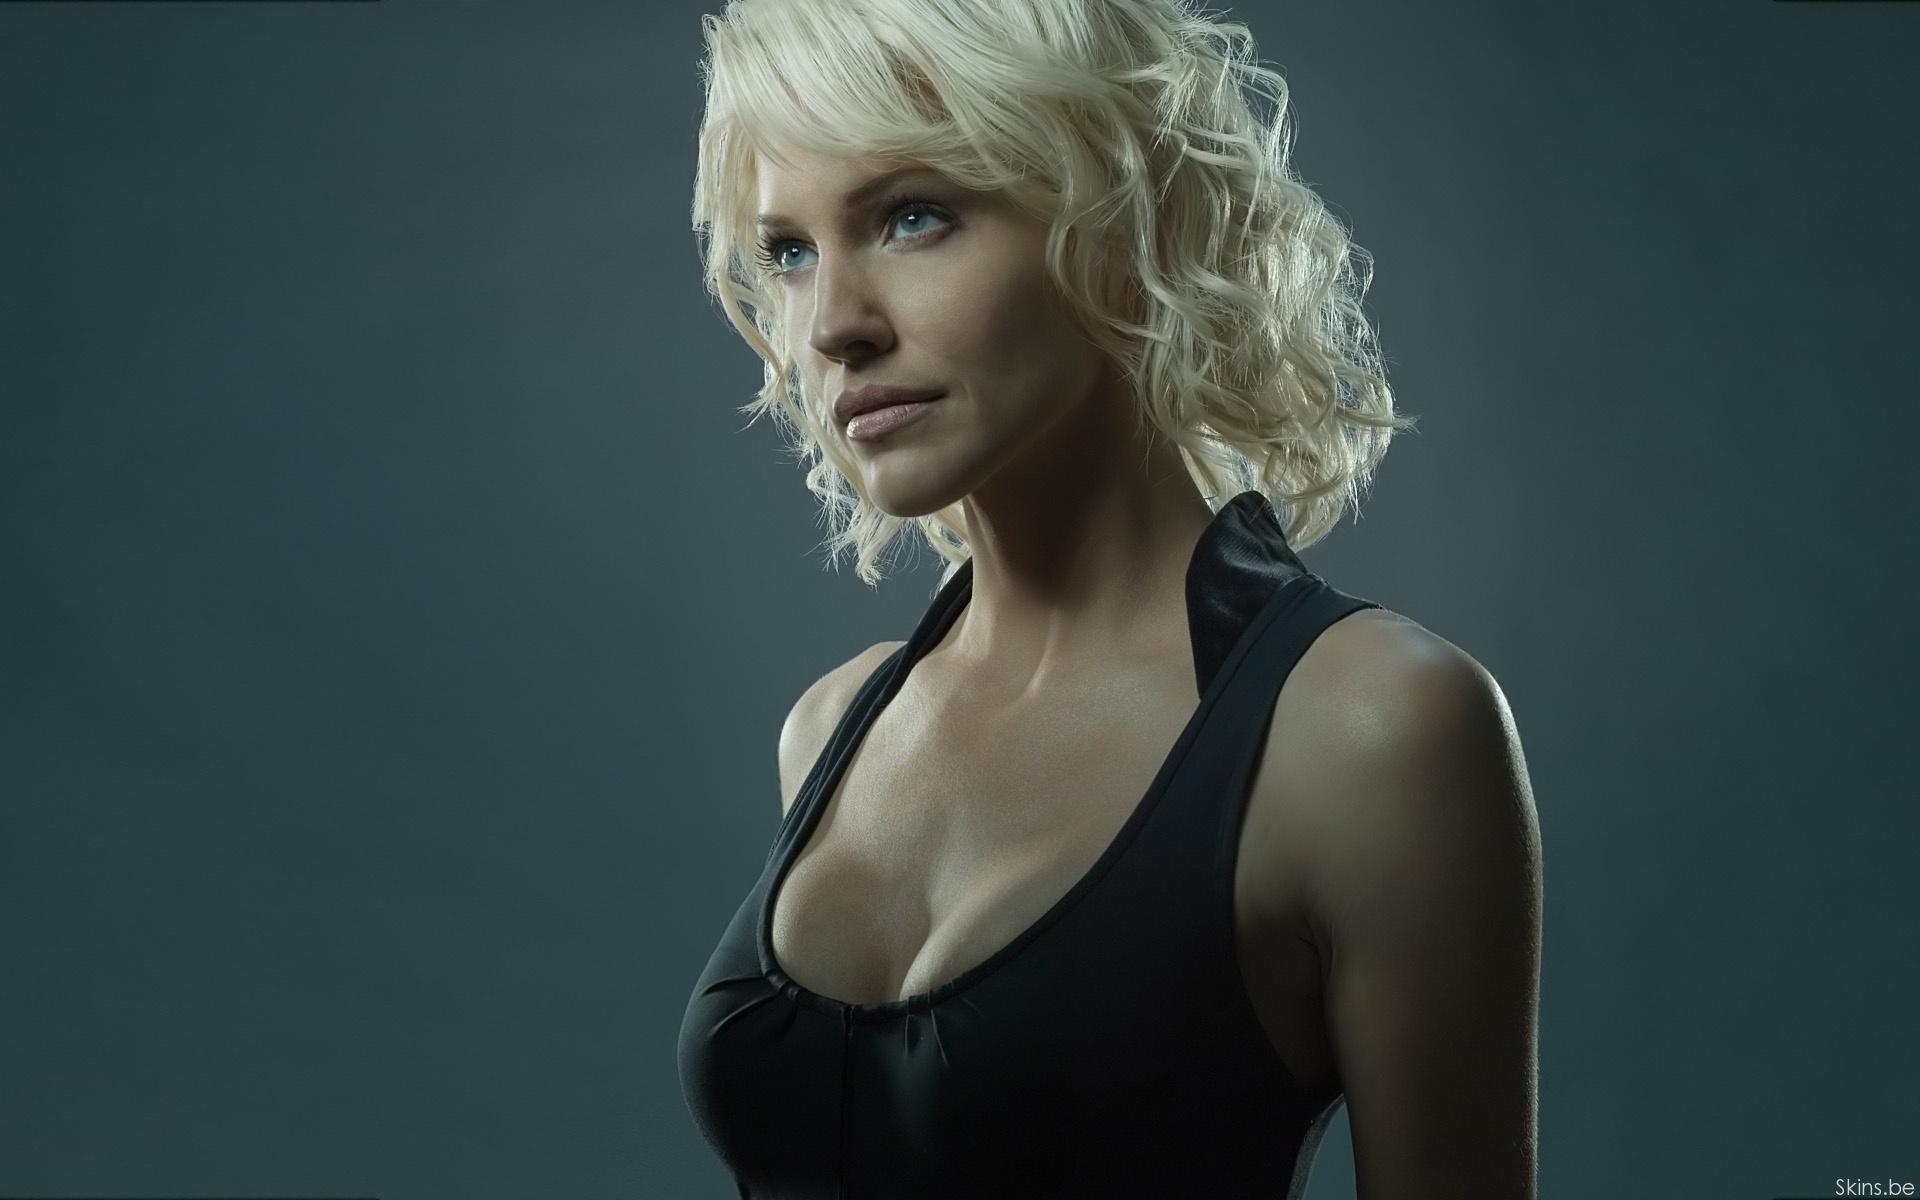 Galactica nude Nude Photos 2